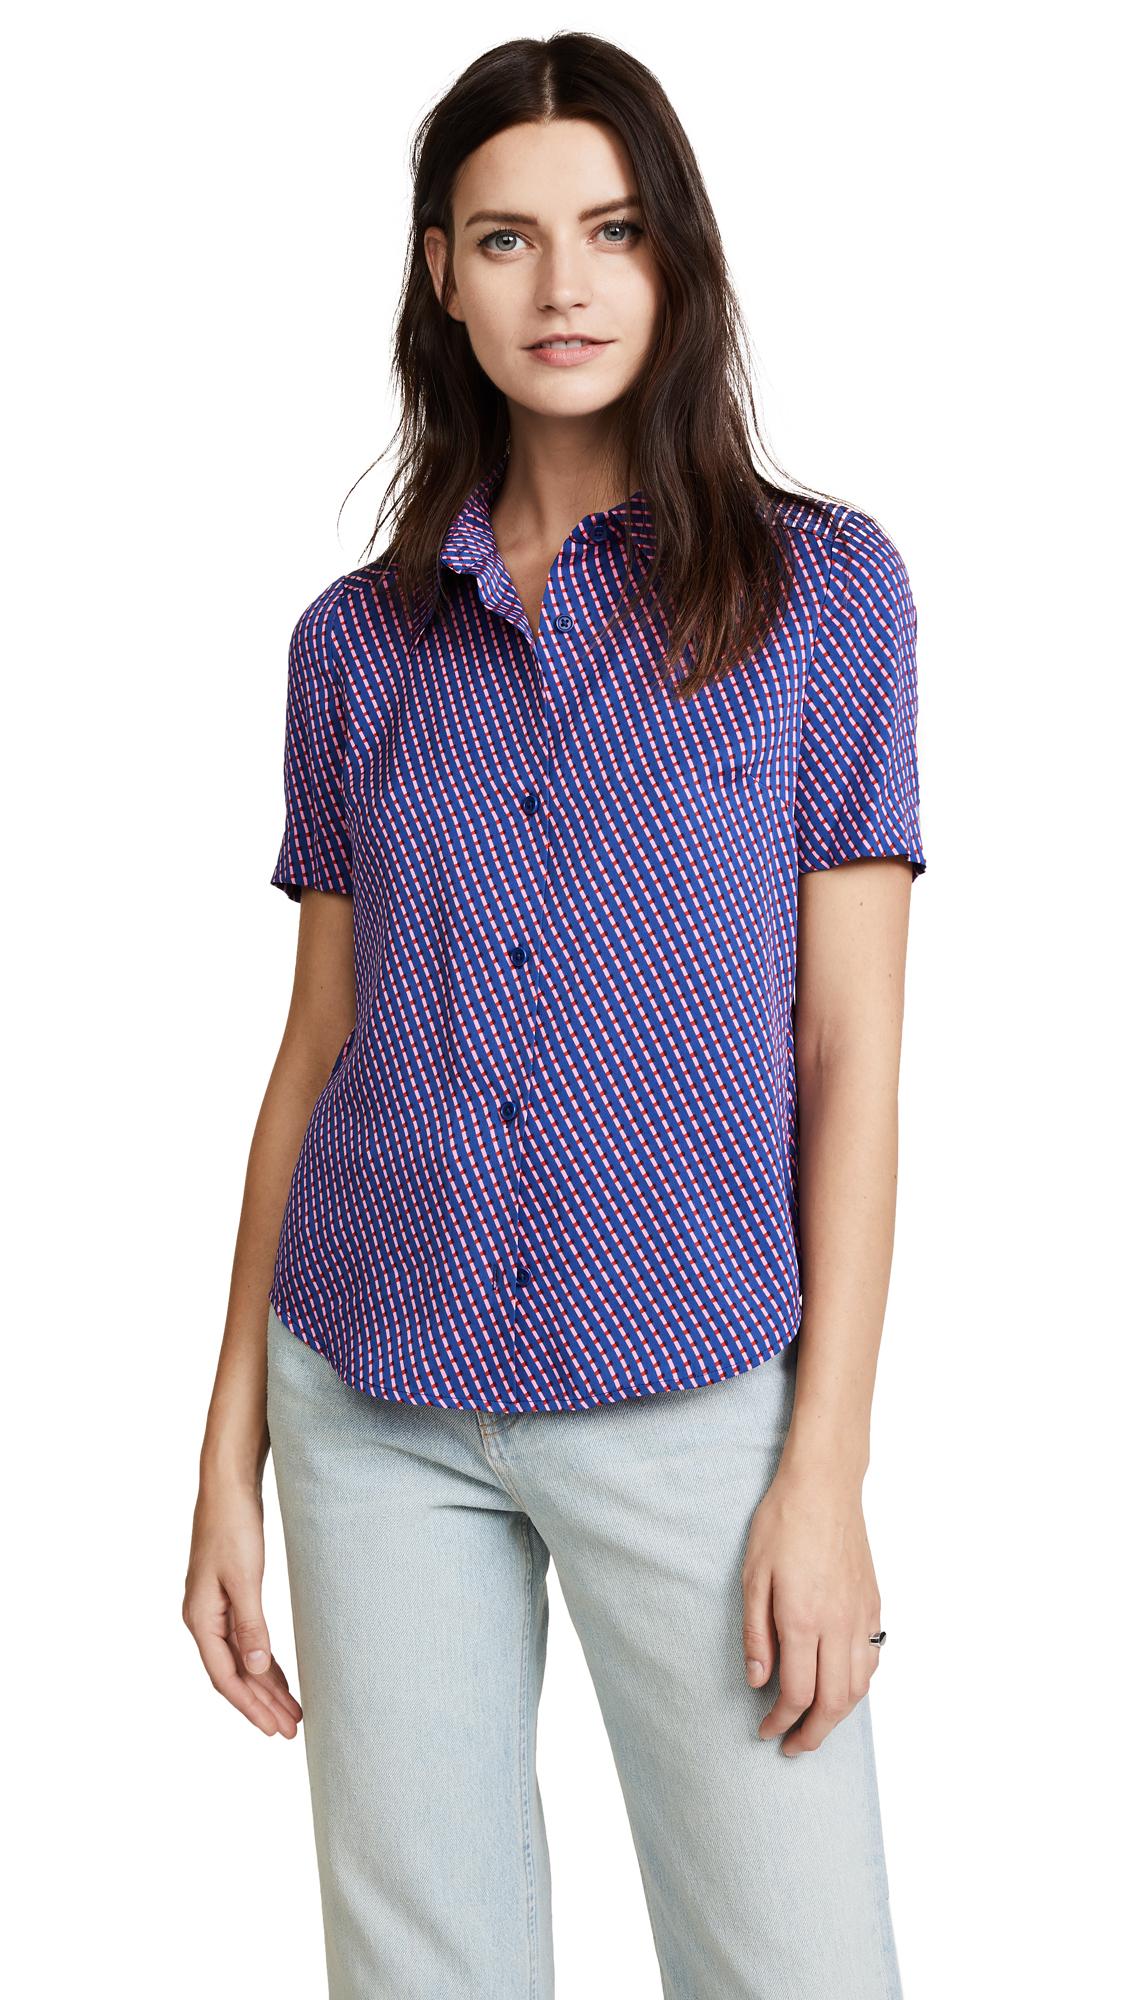 Diane von Furstenberg Short Sleeve Collar Shirt - Elba Royal